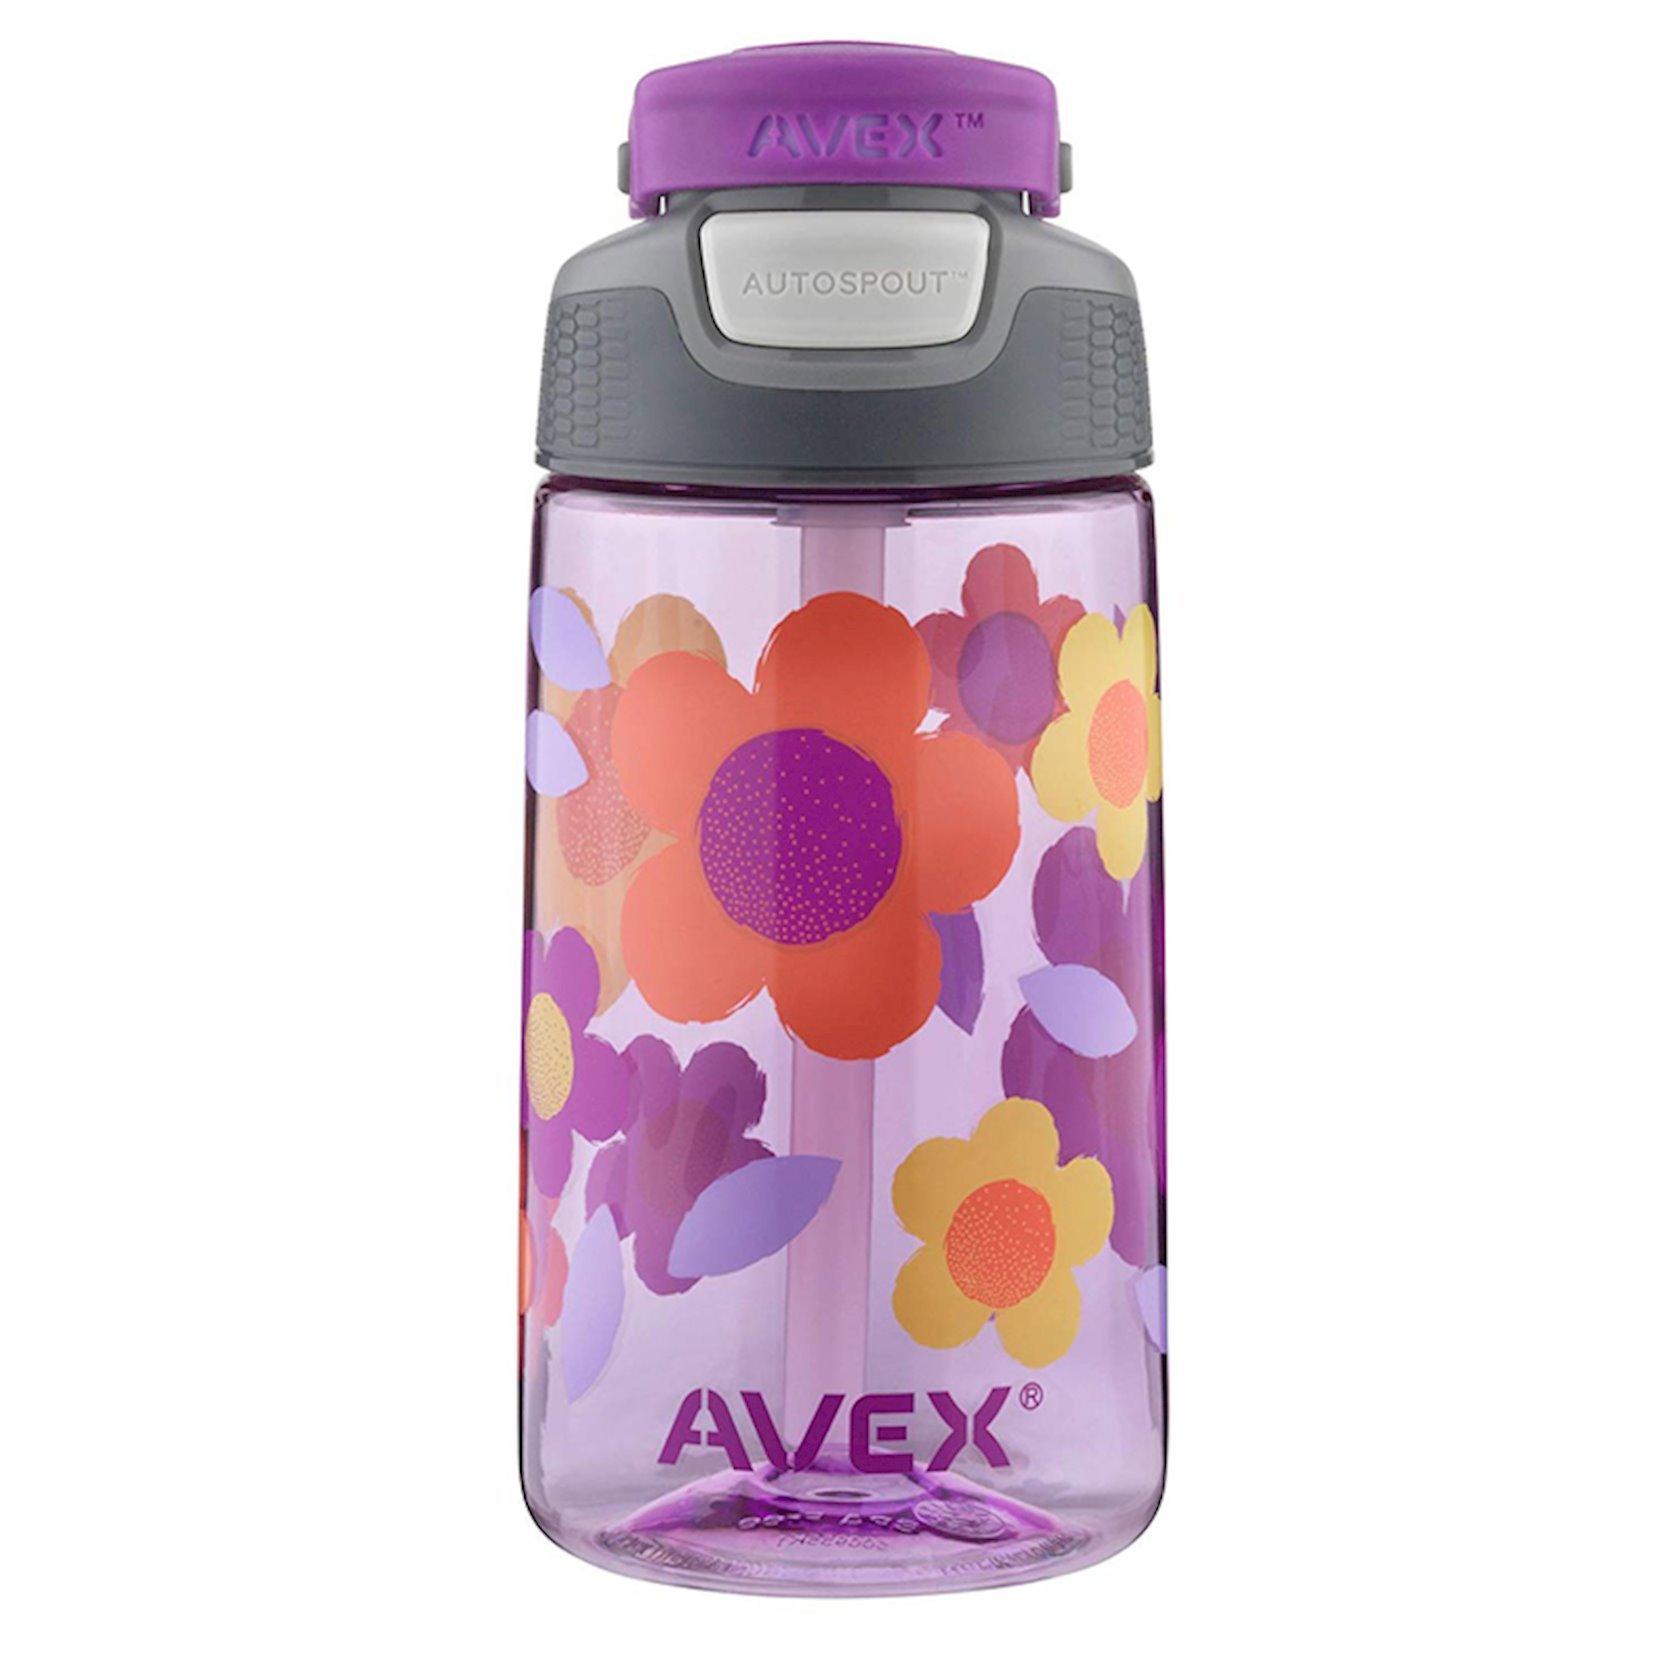 Butulka Avex Freestyle Light Purple Flower, 473 ml, Bənövşəyi